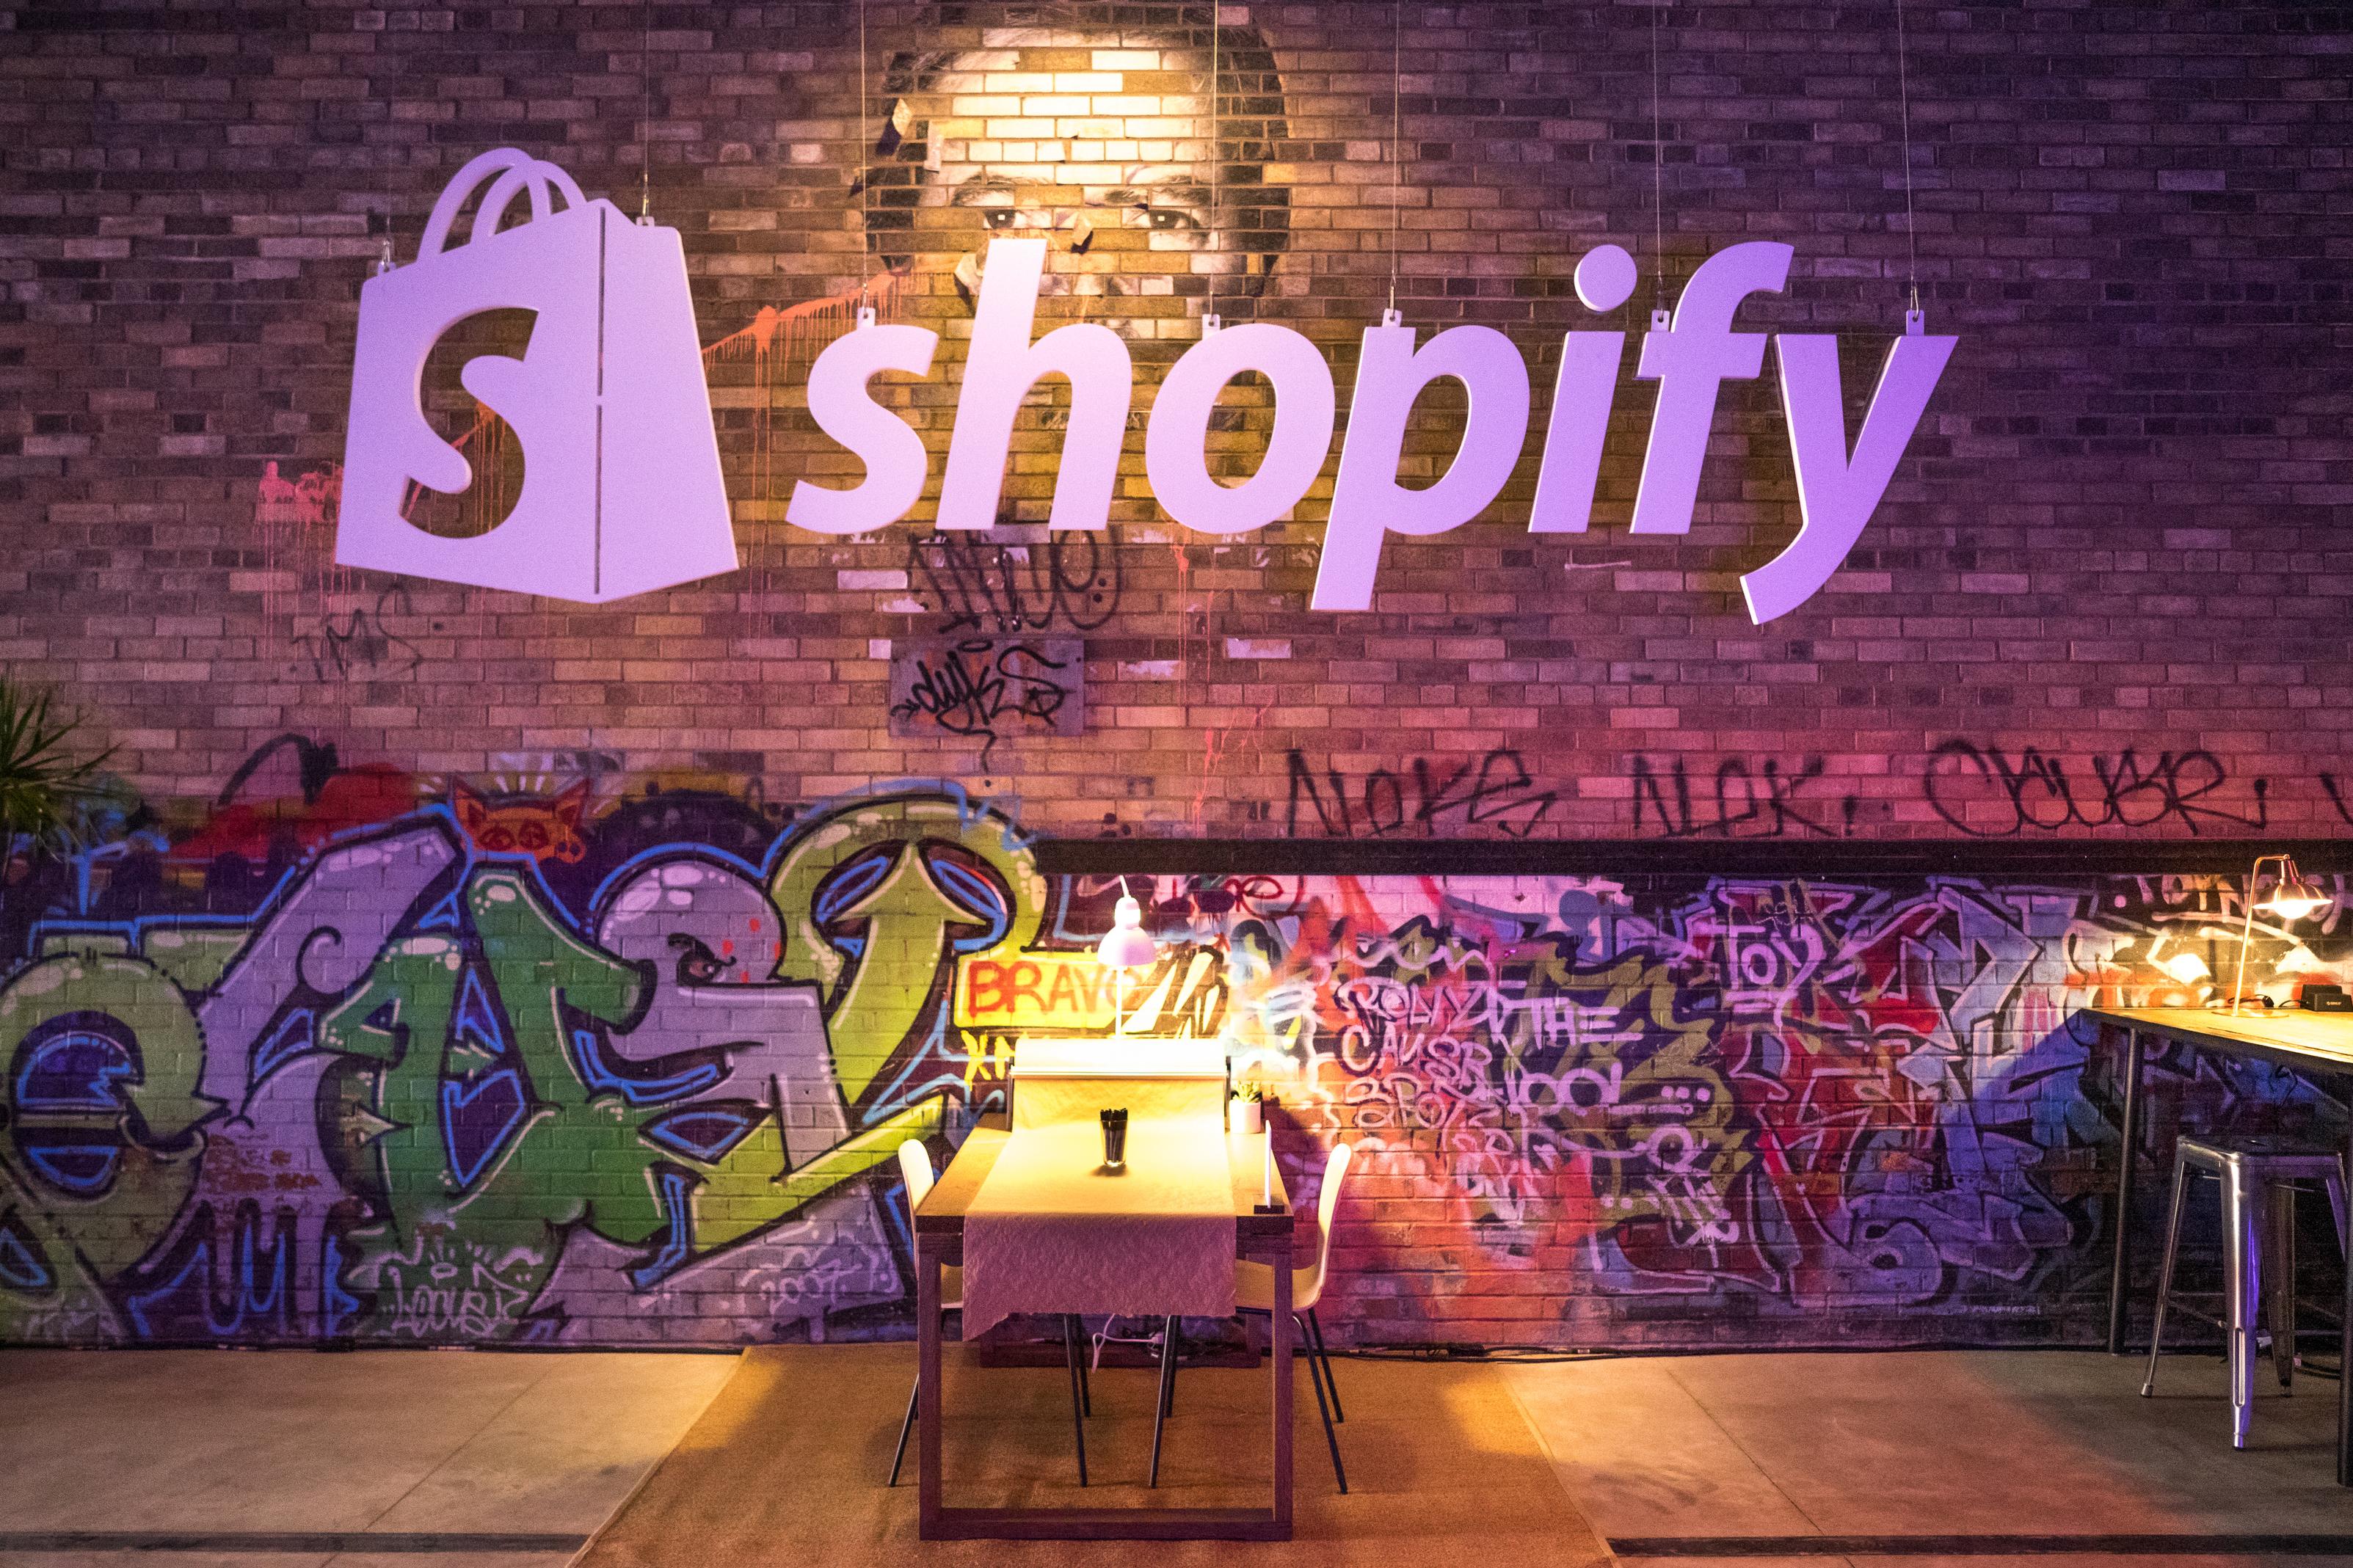 Shopify Makes a $450 Million Move to Take On Amazon | The